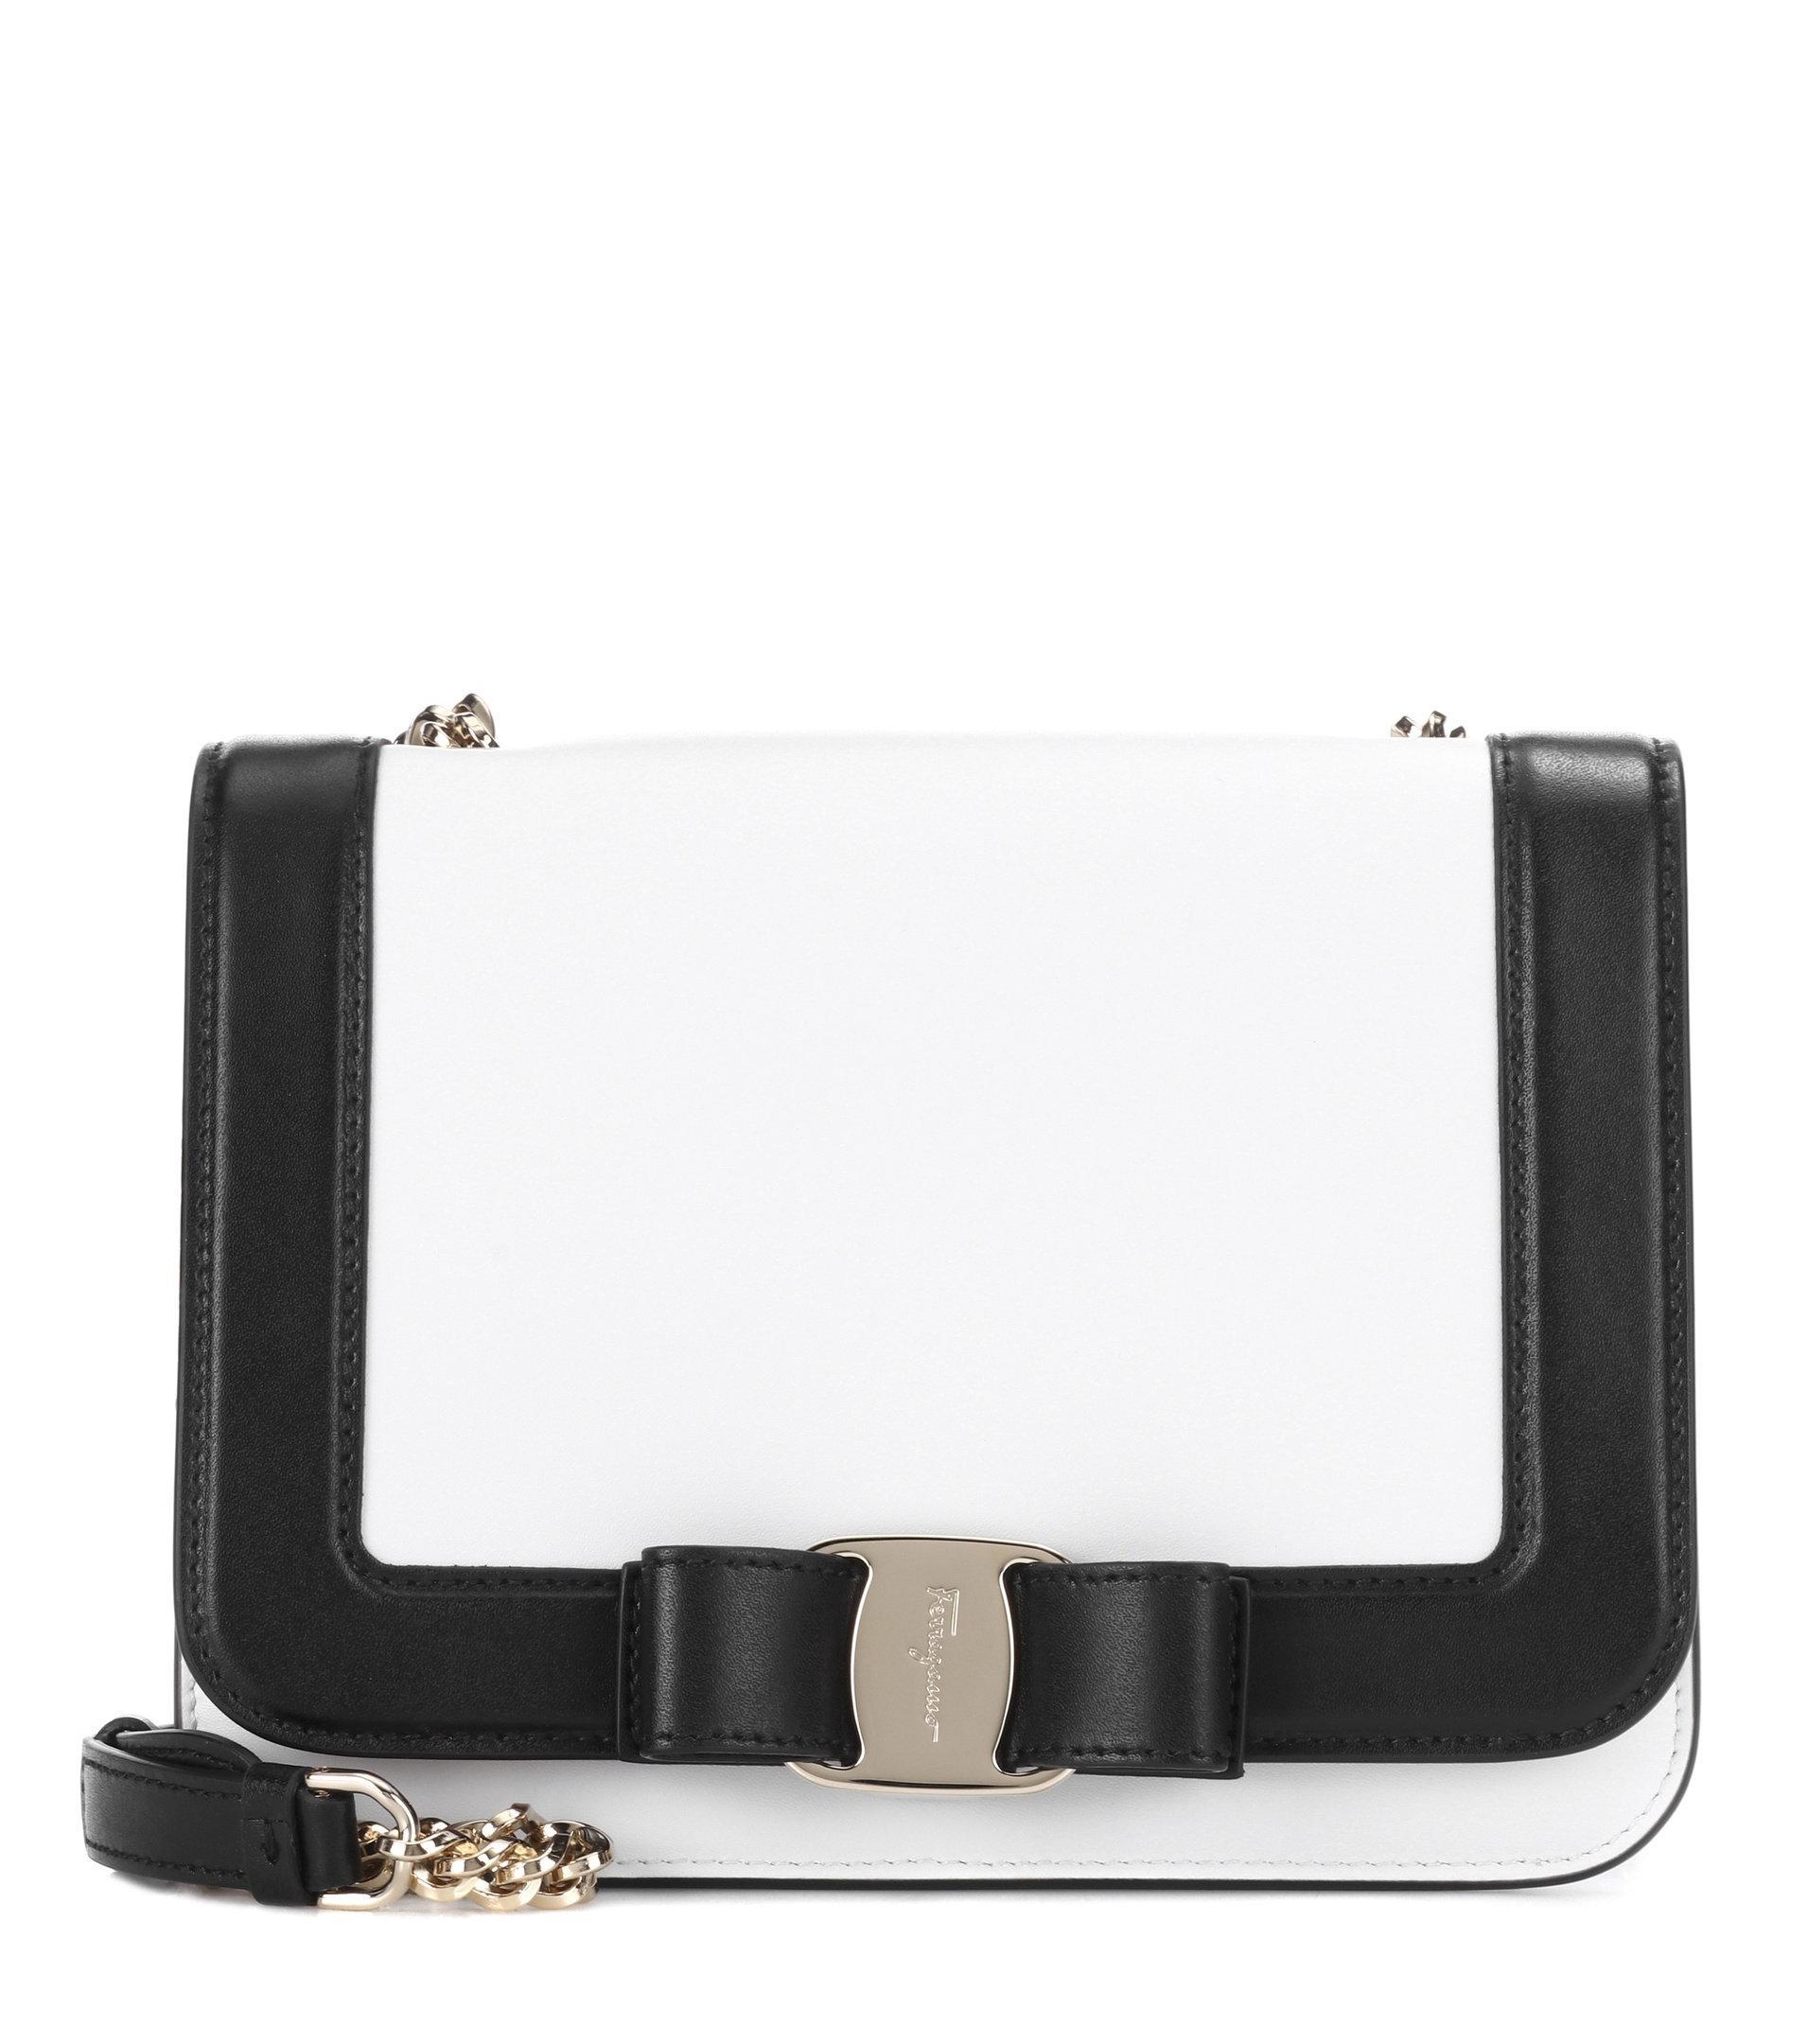 2d818544d0 Lyst - Ferragamo Small Vara Rainbow Leather Shoulder Bag in White